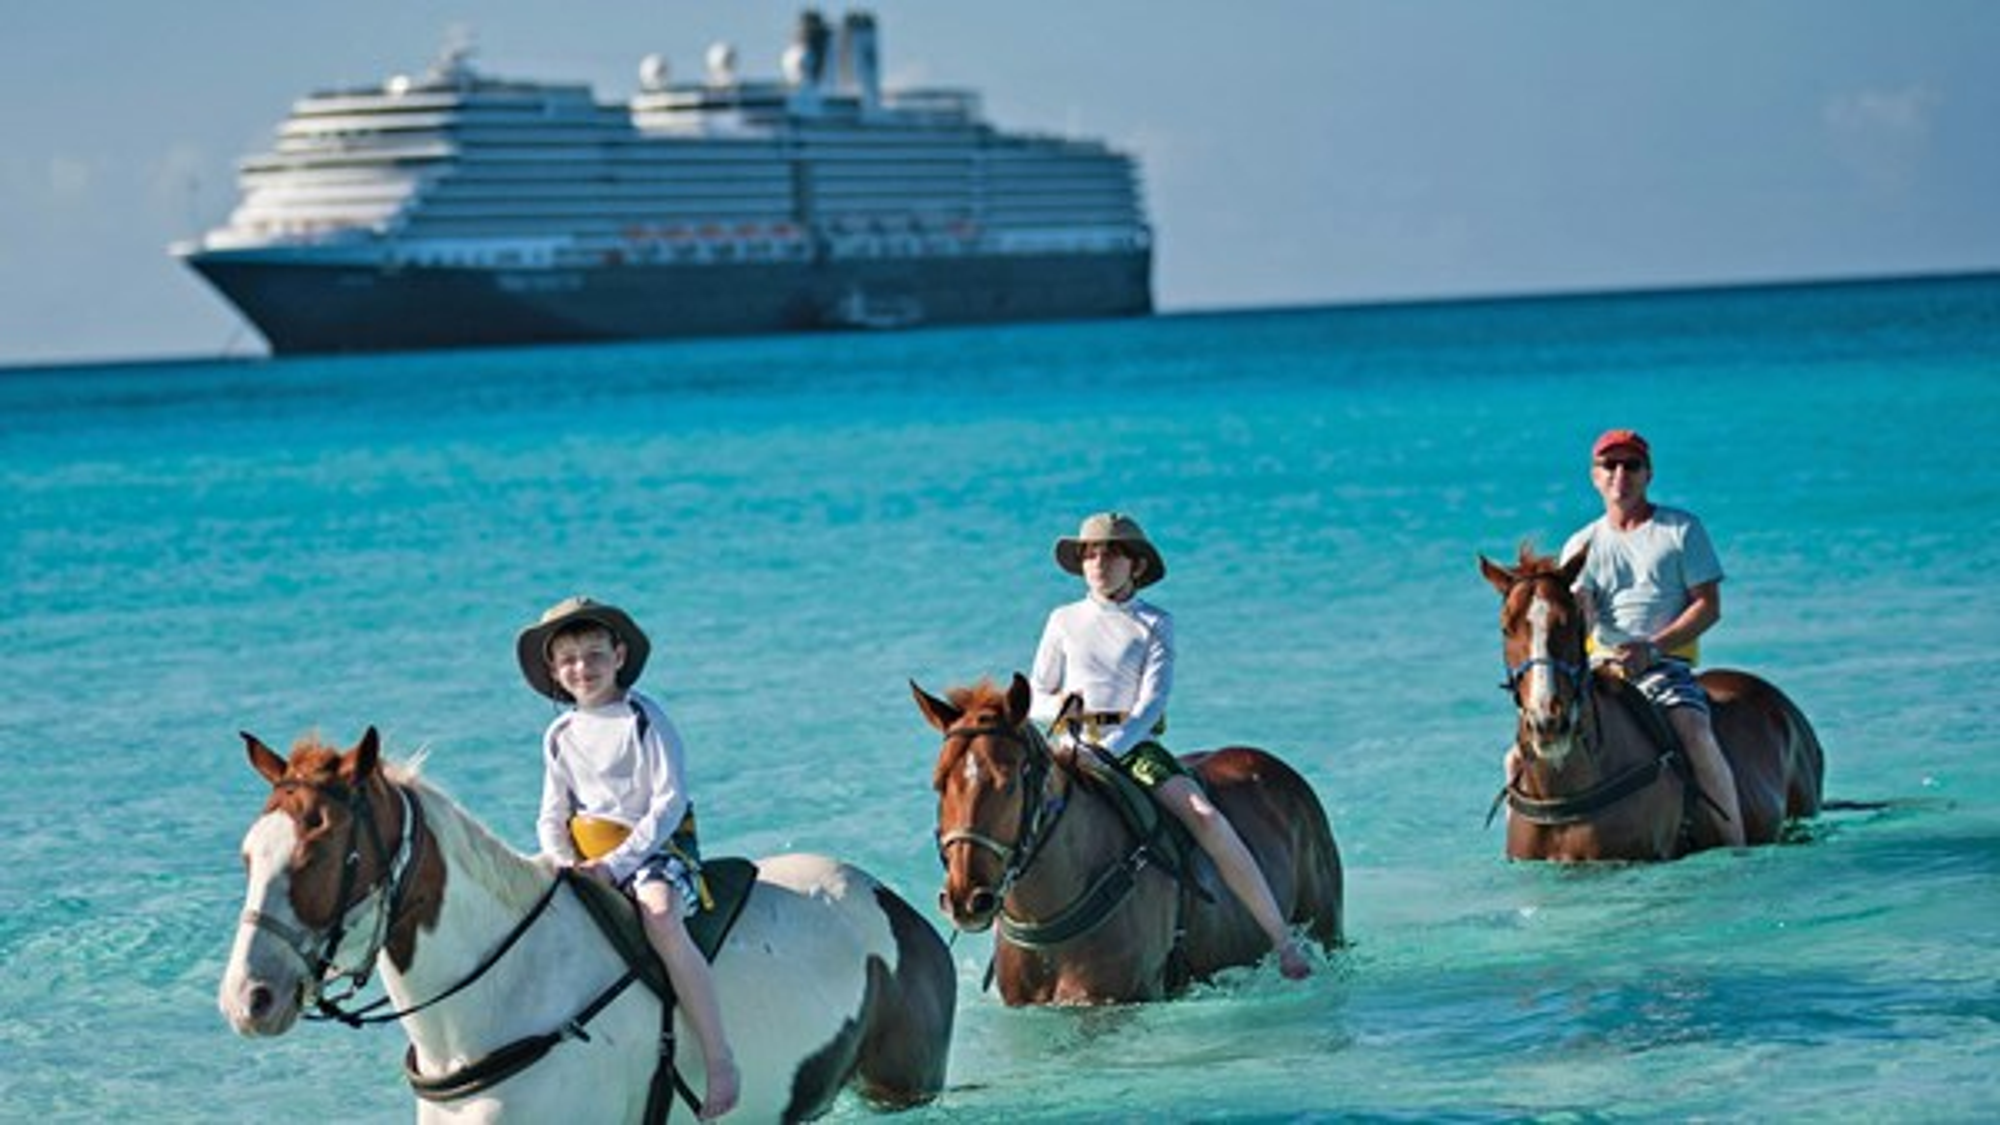 Horseback riding at Half Moon Cay, Holland America Line's island in the Bahamas.